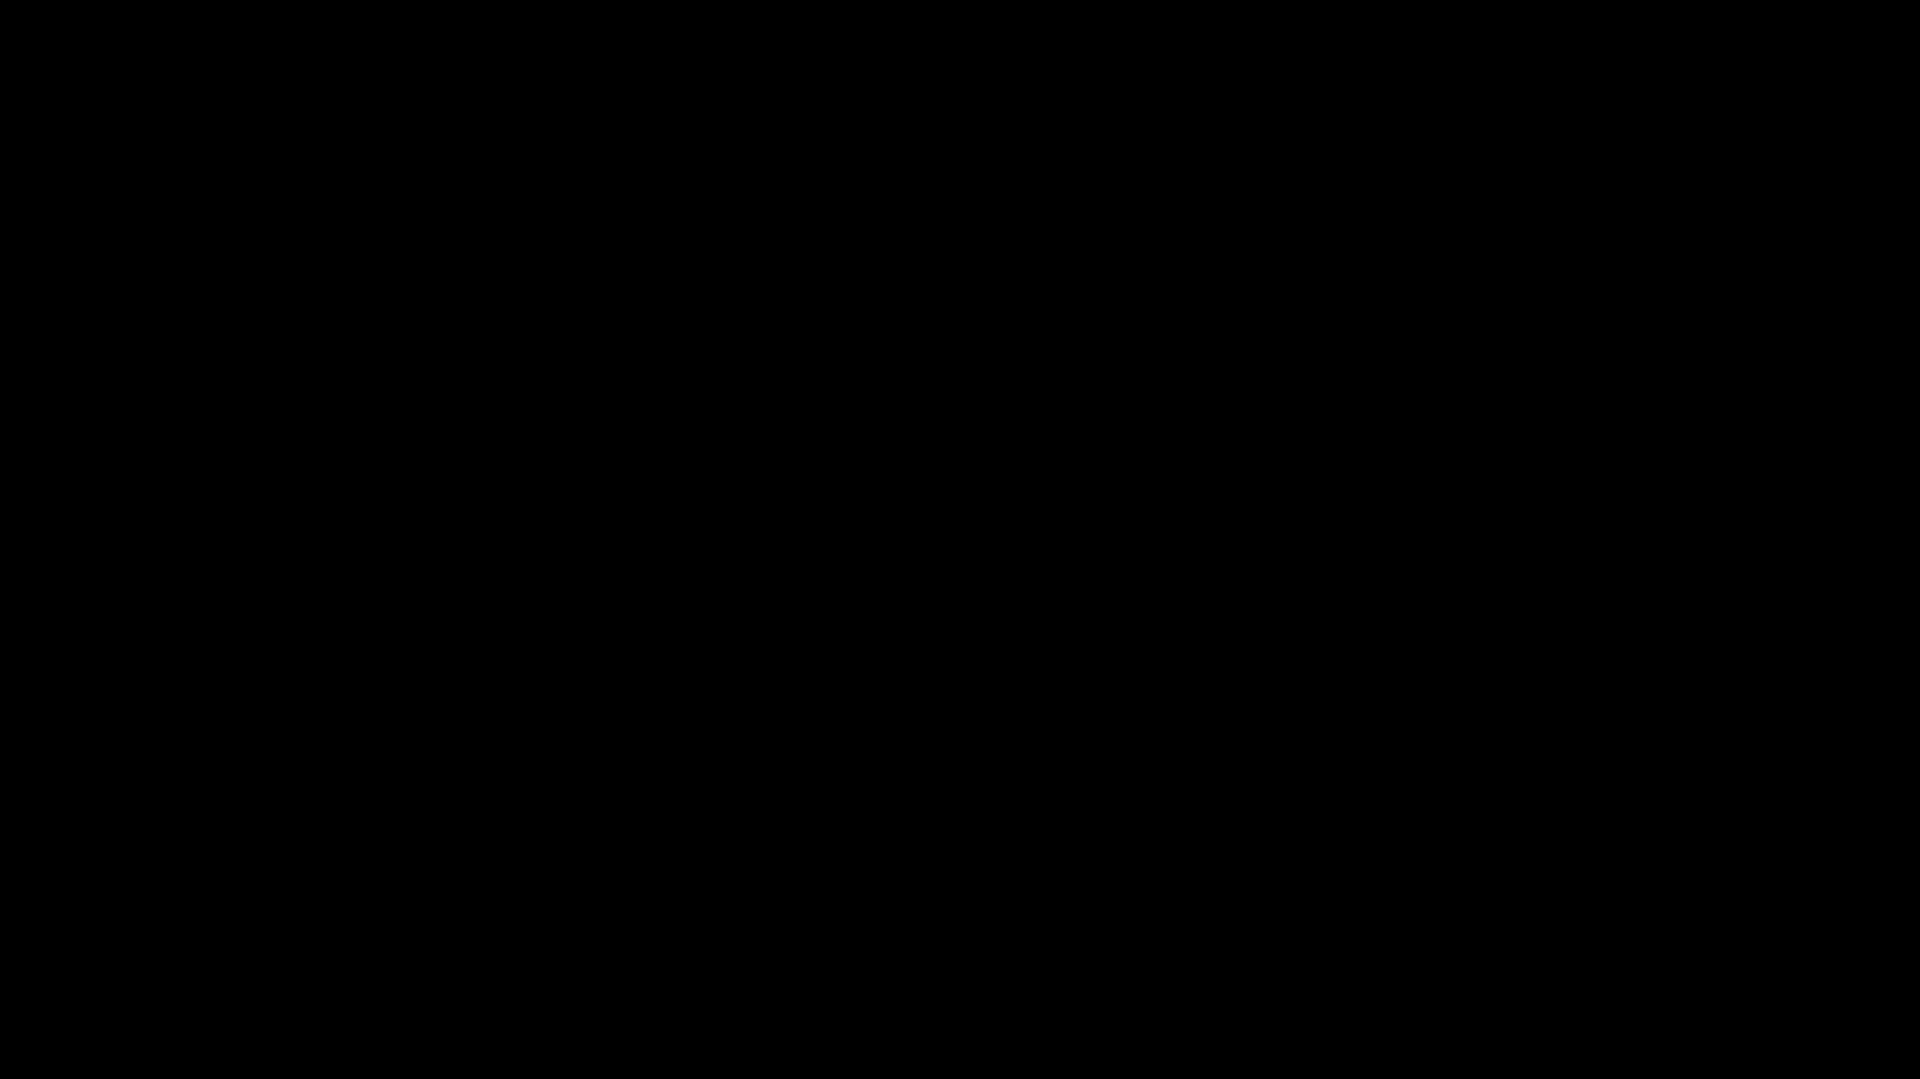 WYSSEN DEFENCE Sniper Chassissystem Set, schwarz